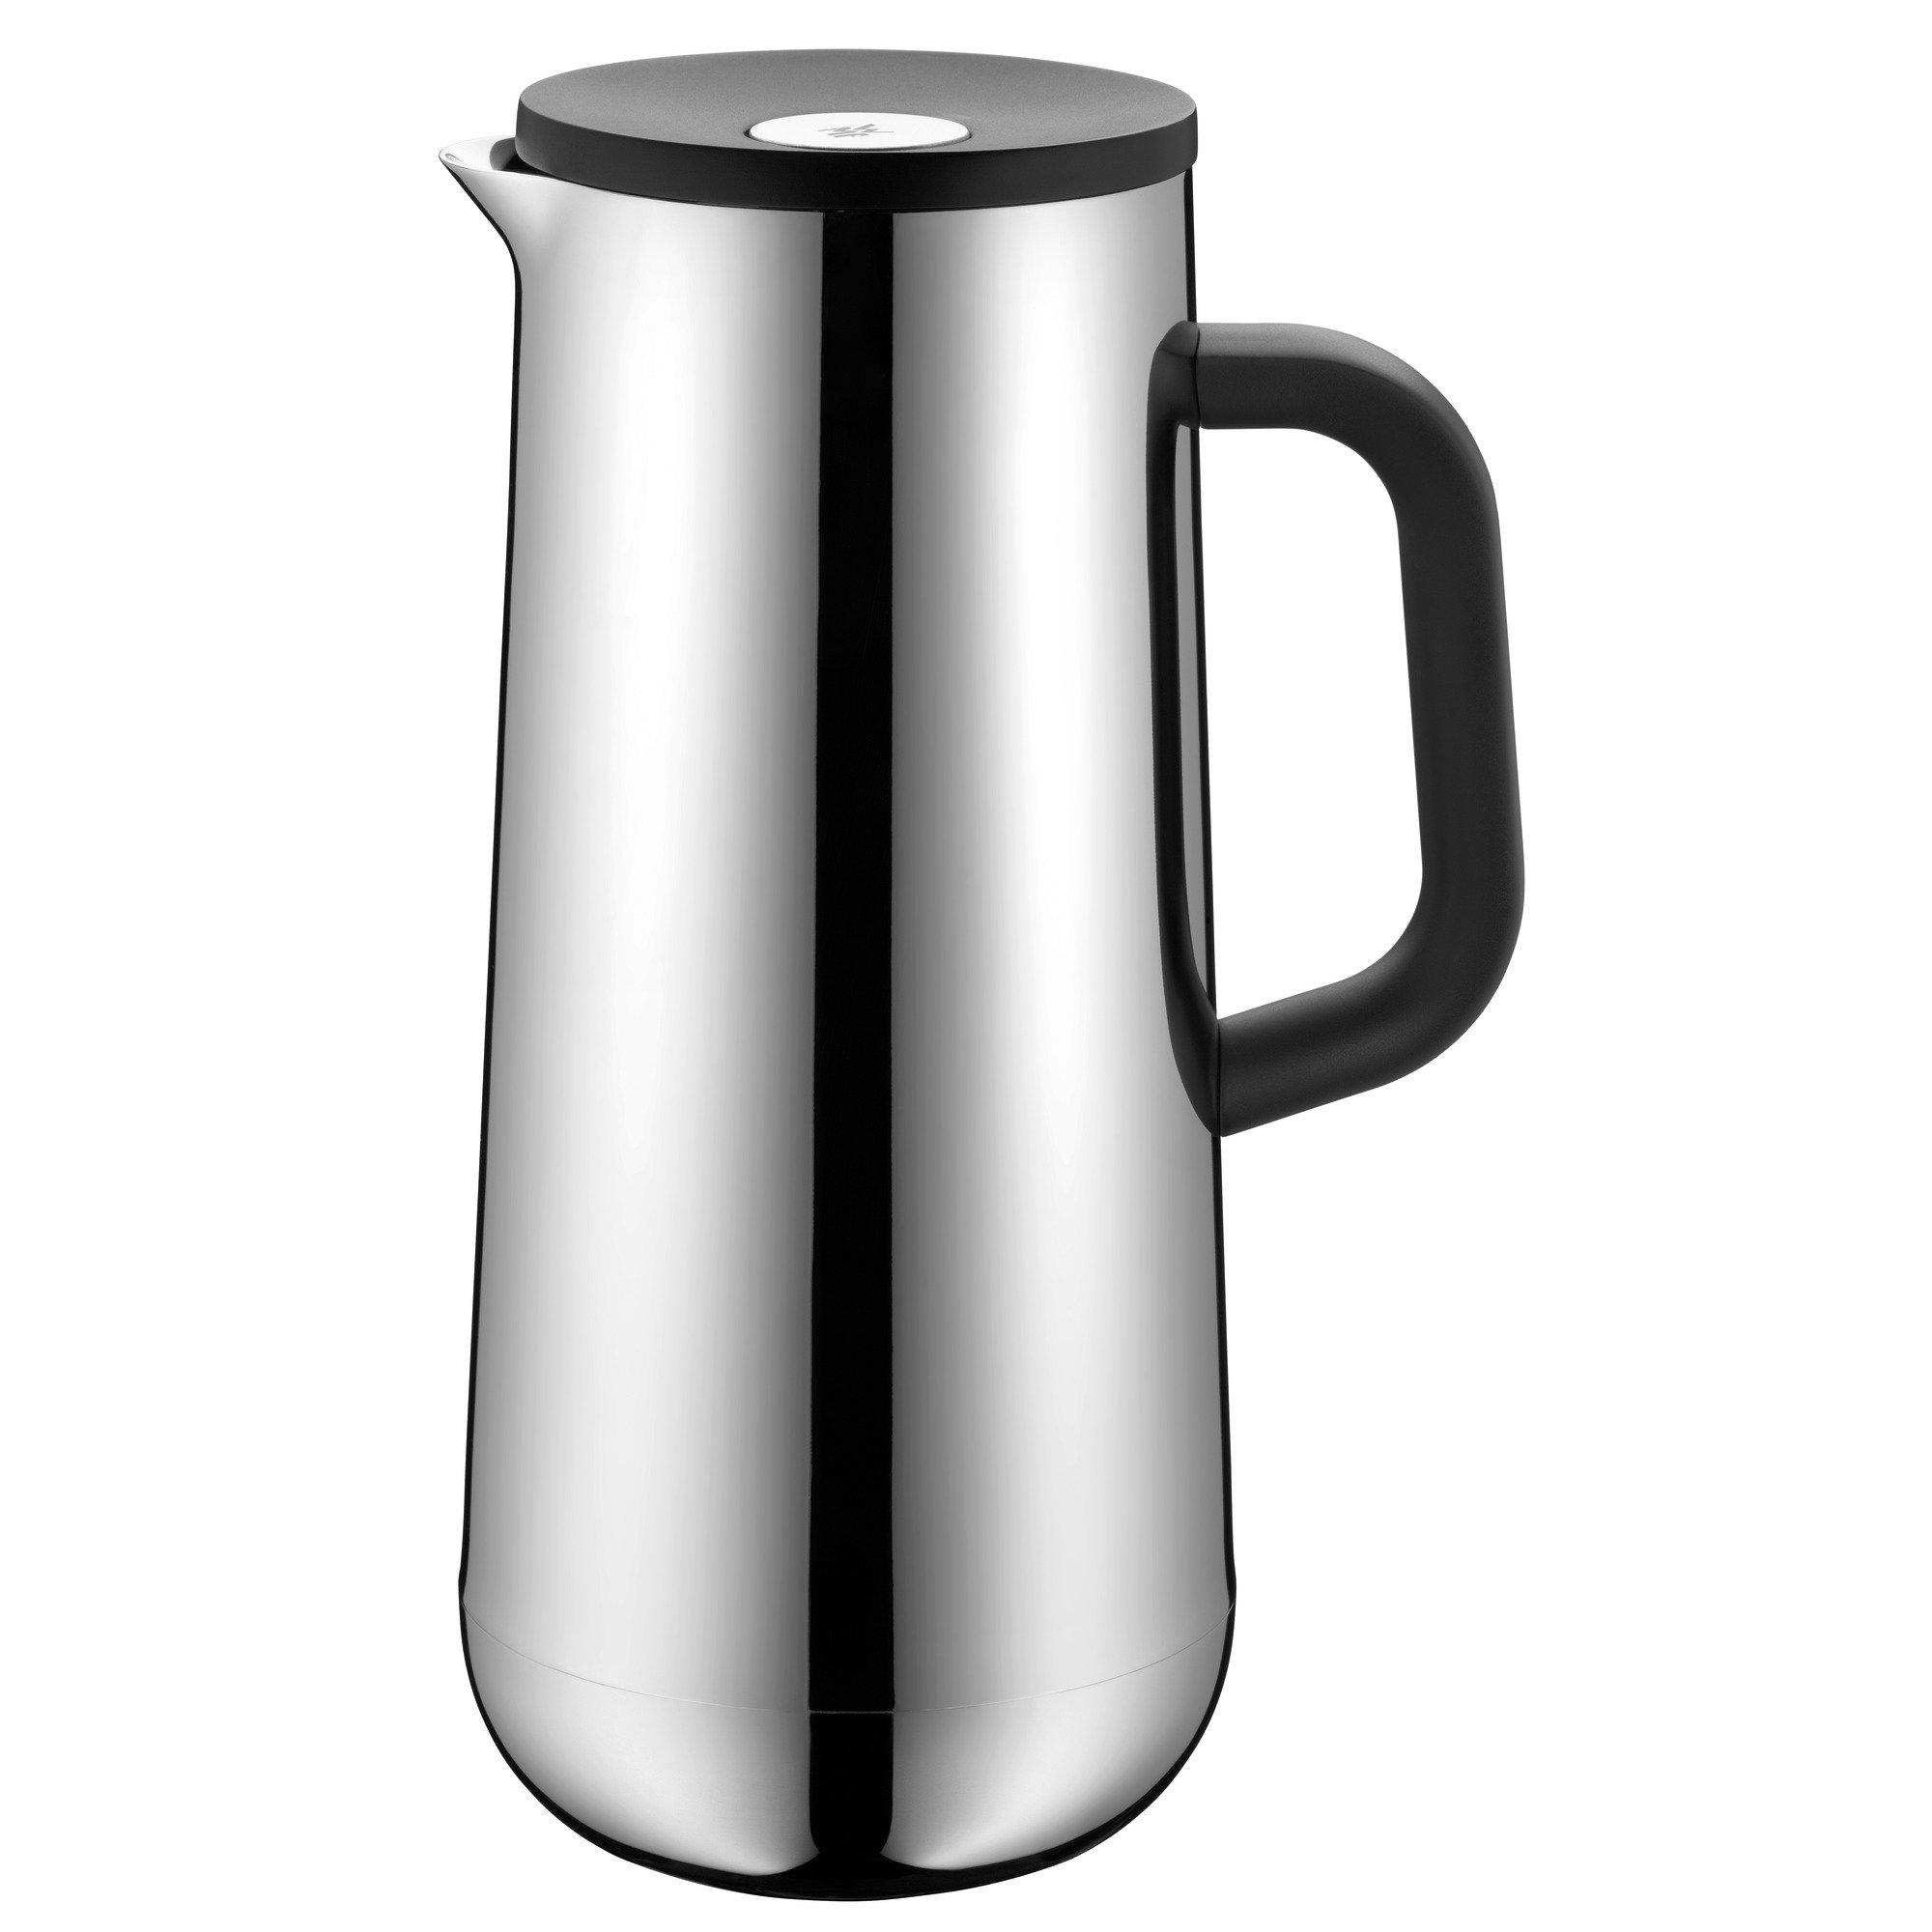 Isolierkanne Kaffee 1,0l Impulse edelstahl